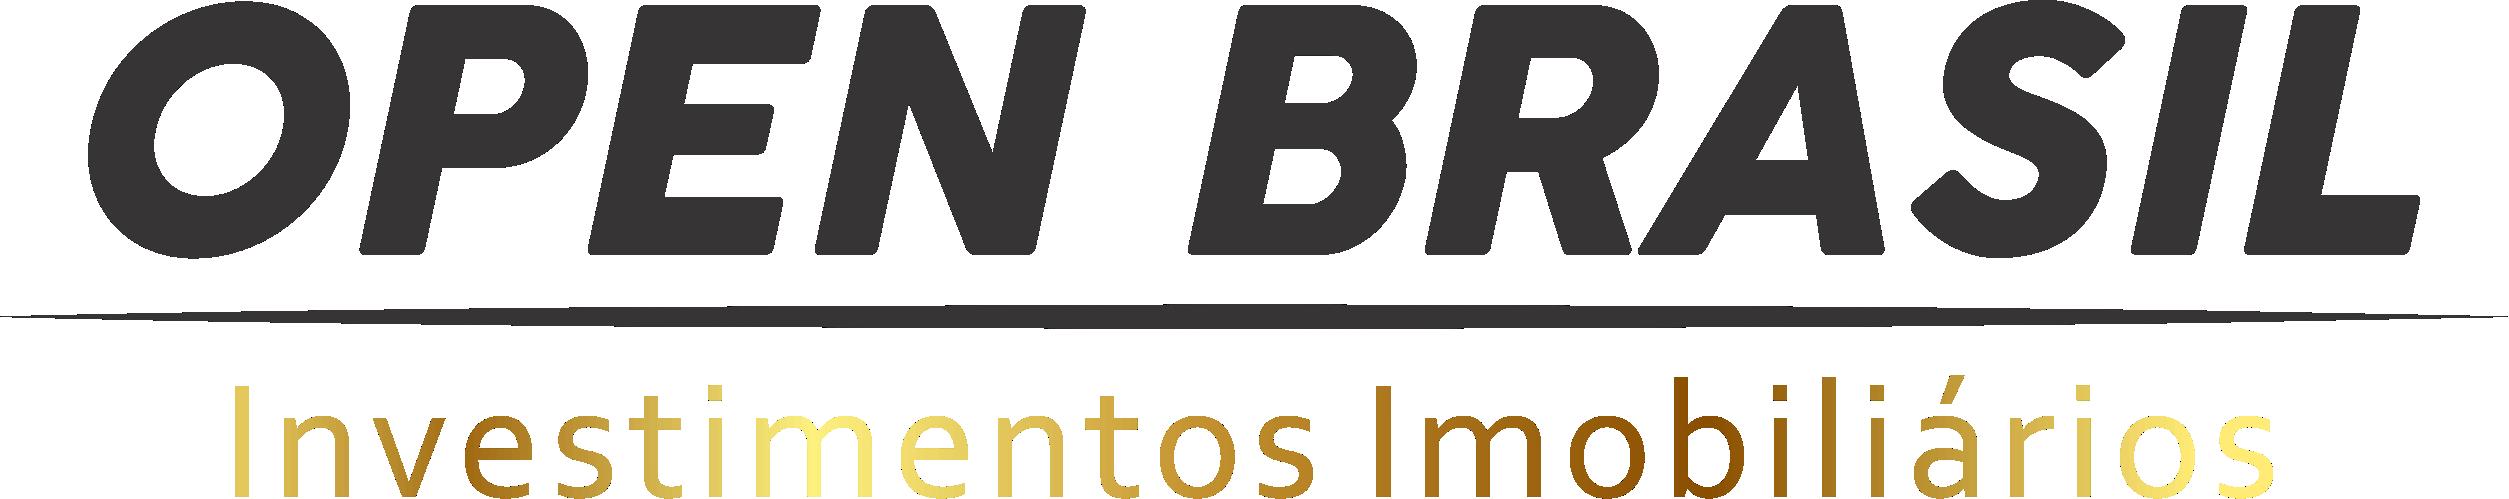 Open Brasil Investimentos